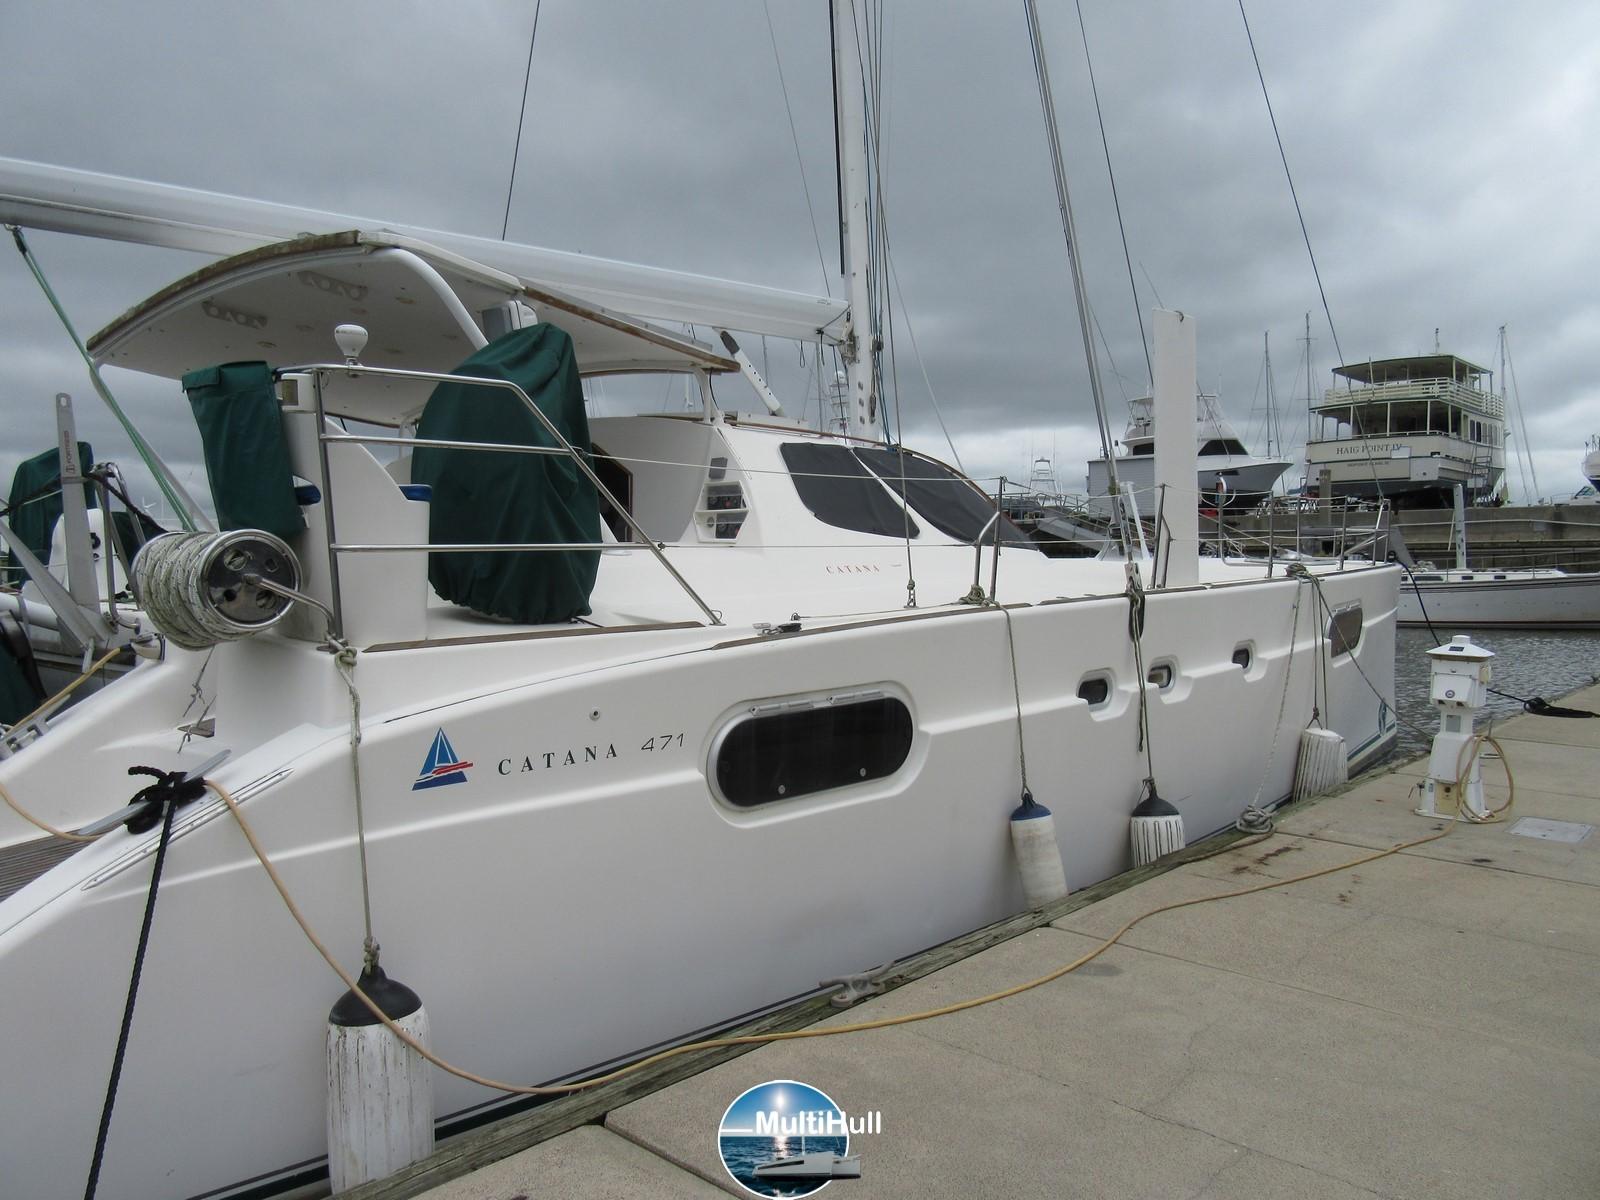 Catana 471 Owner's version